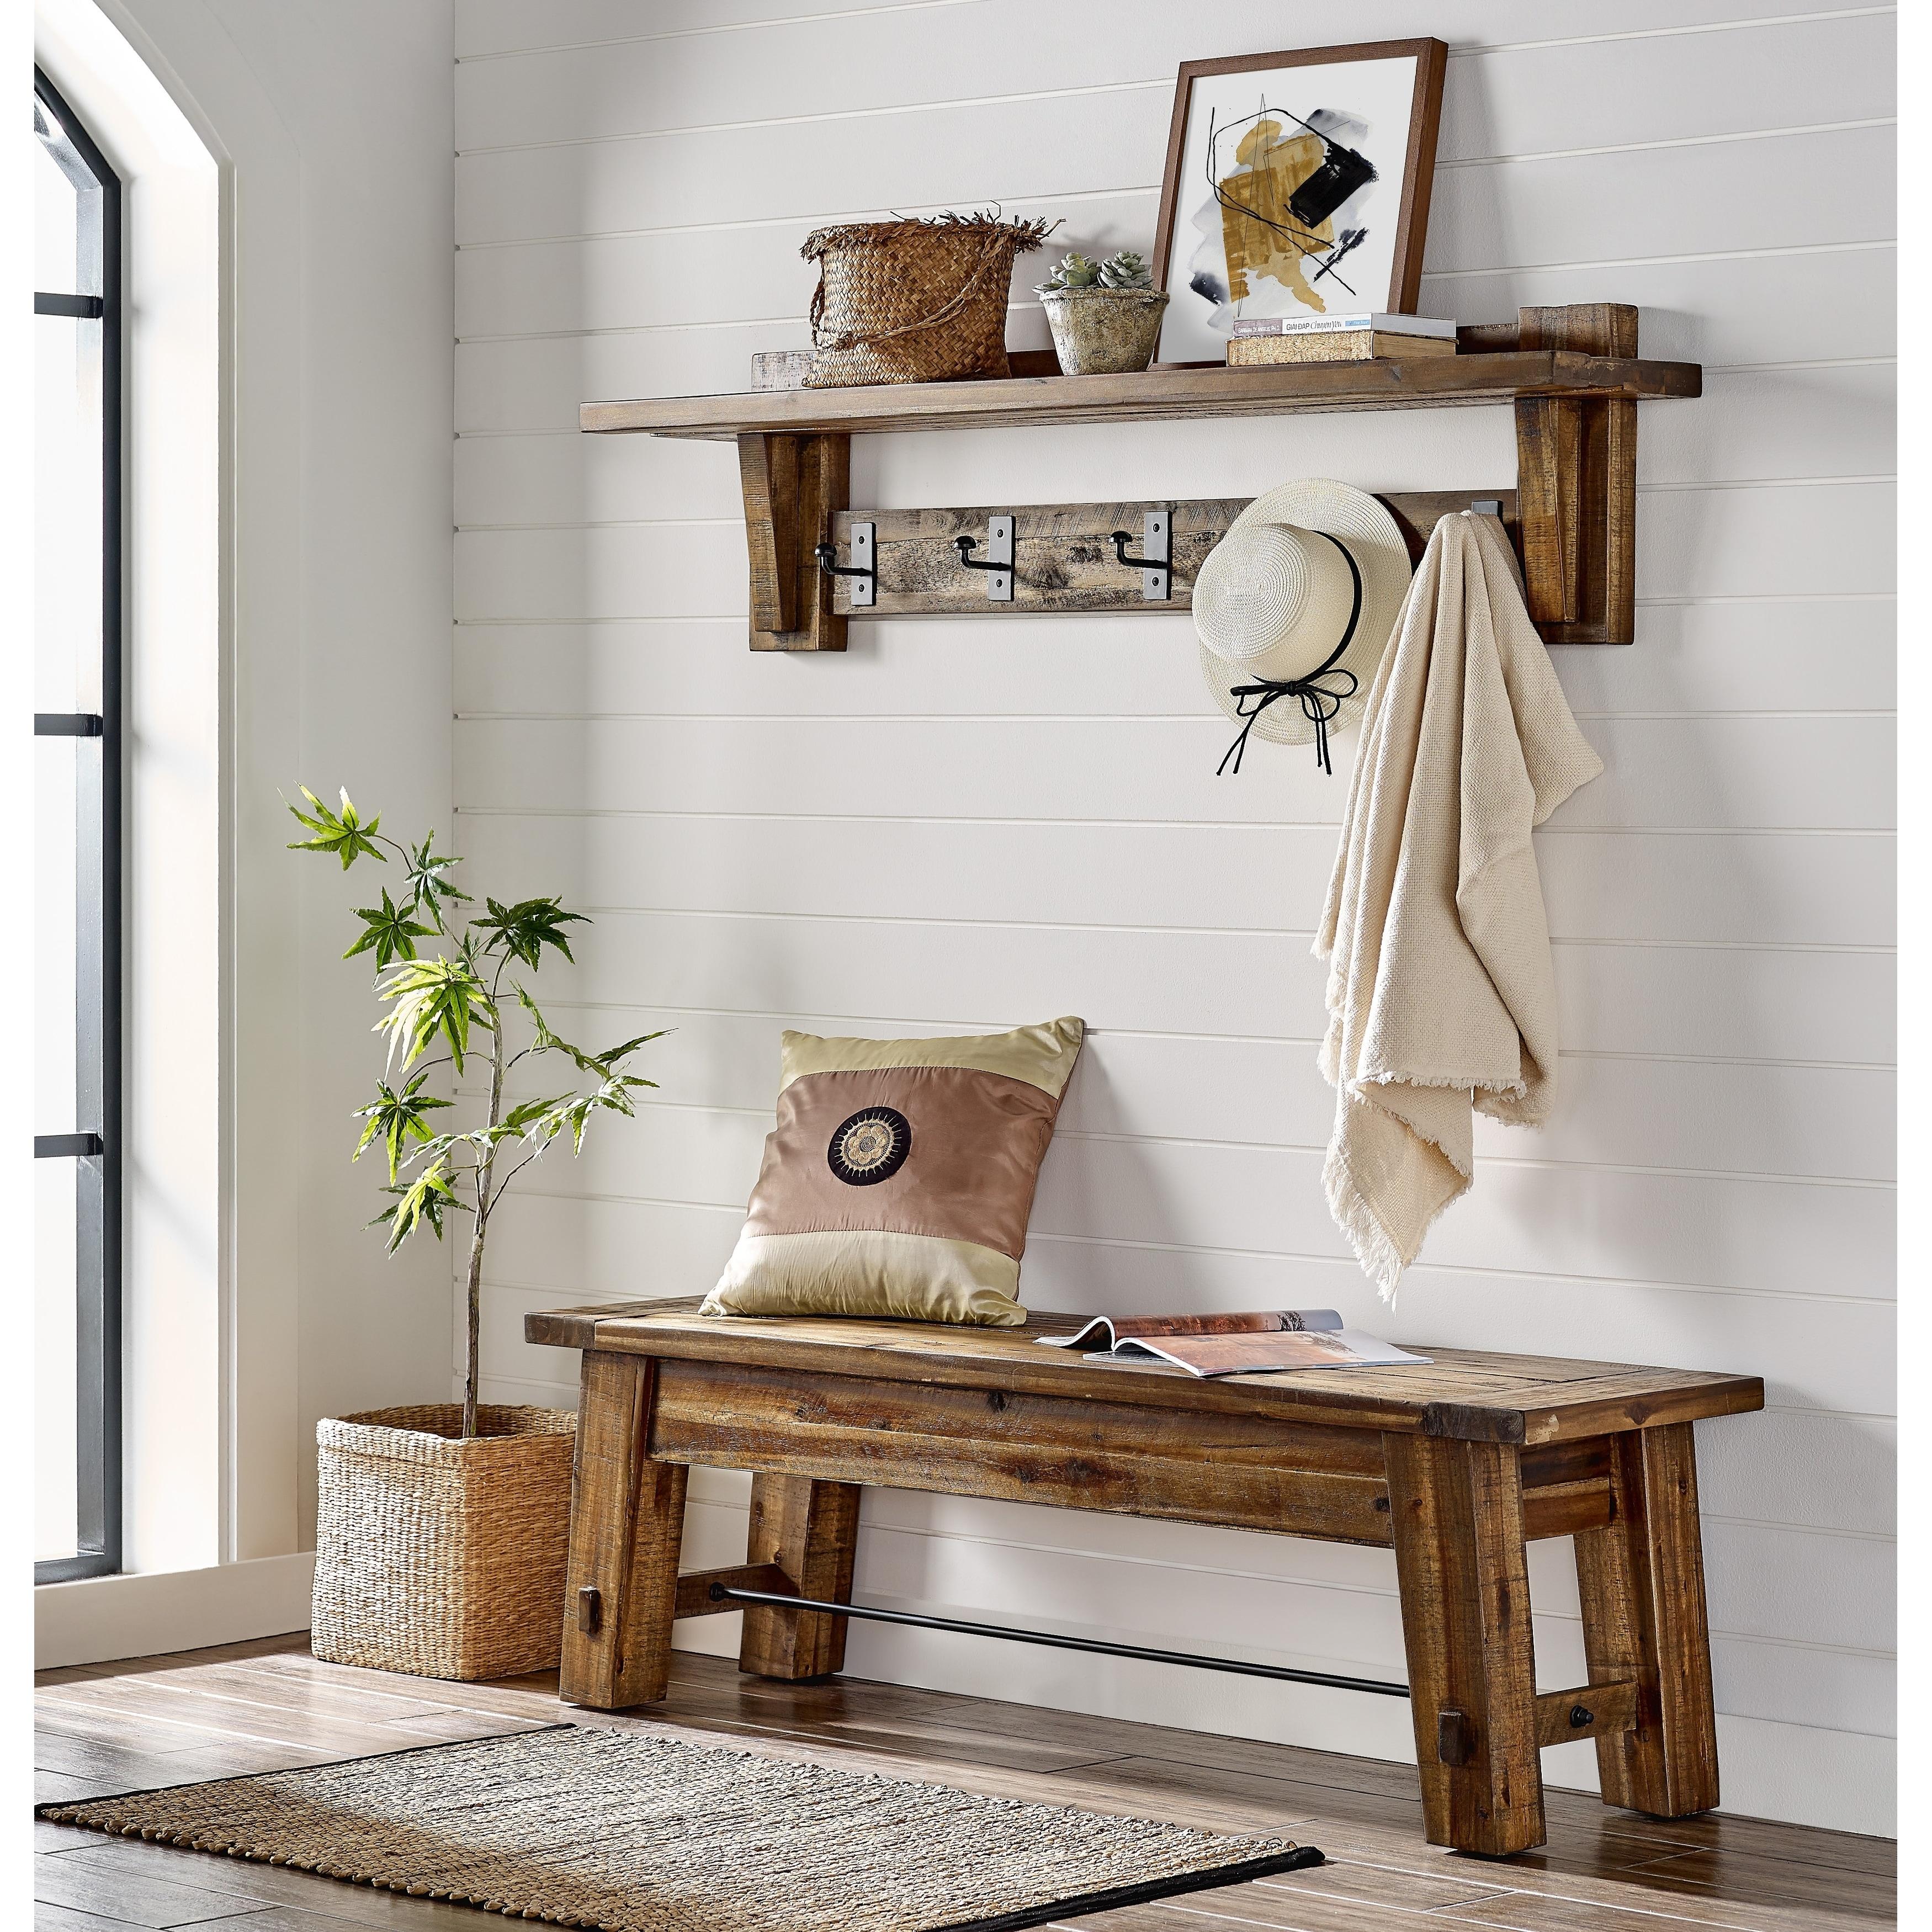 Carbon Loft Bahamondes Wood Coat Hook Shelf and Bench Set - On